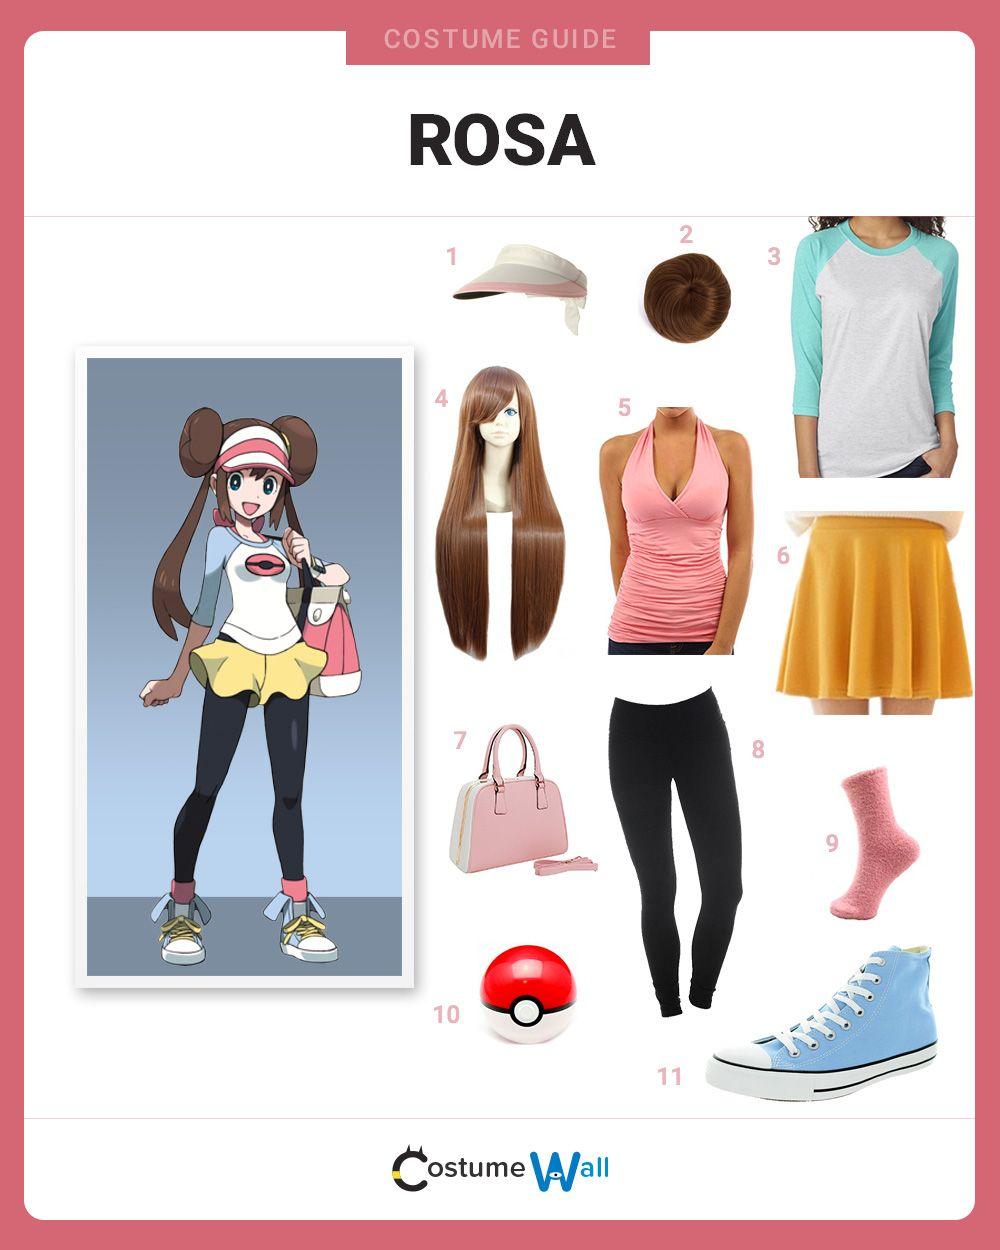 Dress Like Rosa  Pokemon costumes for girls, Cute group halloween